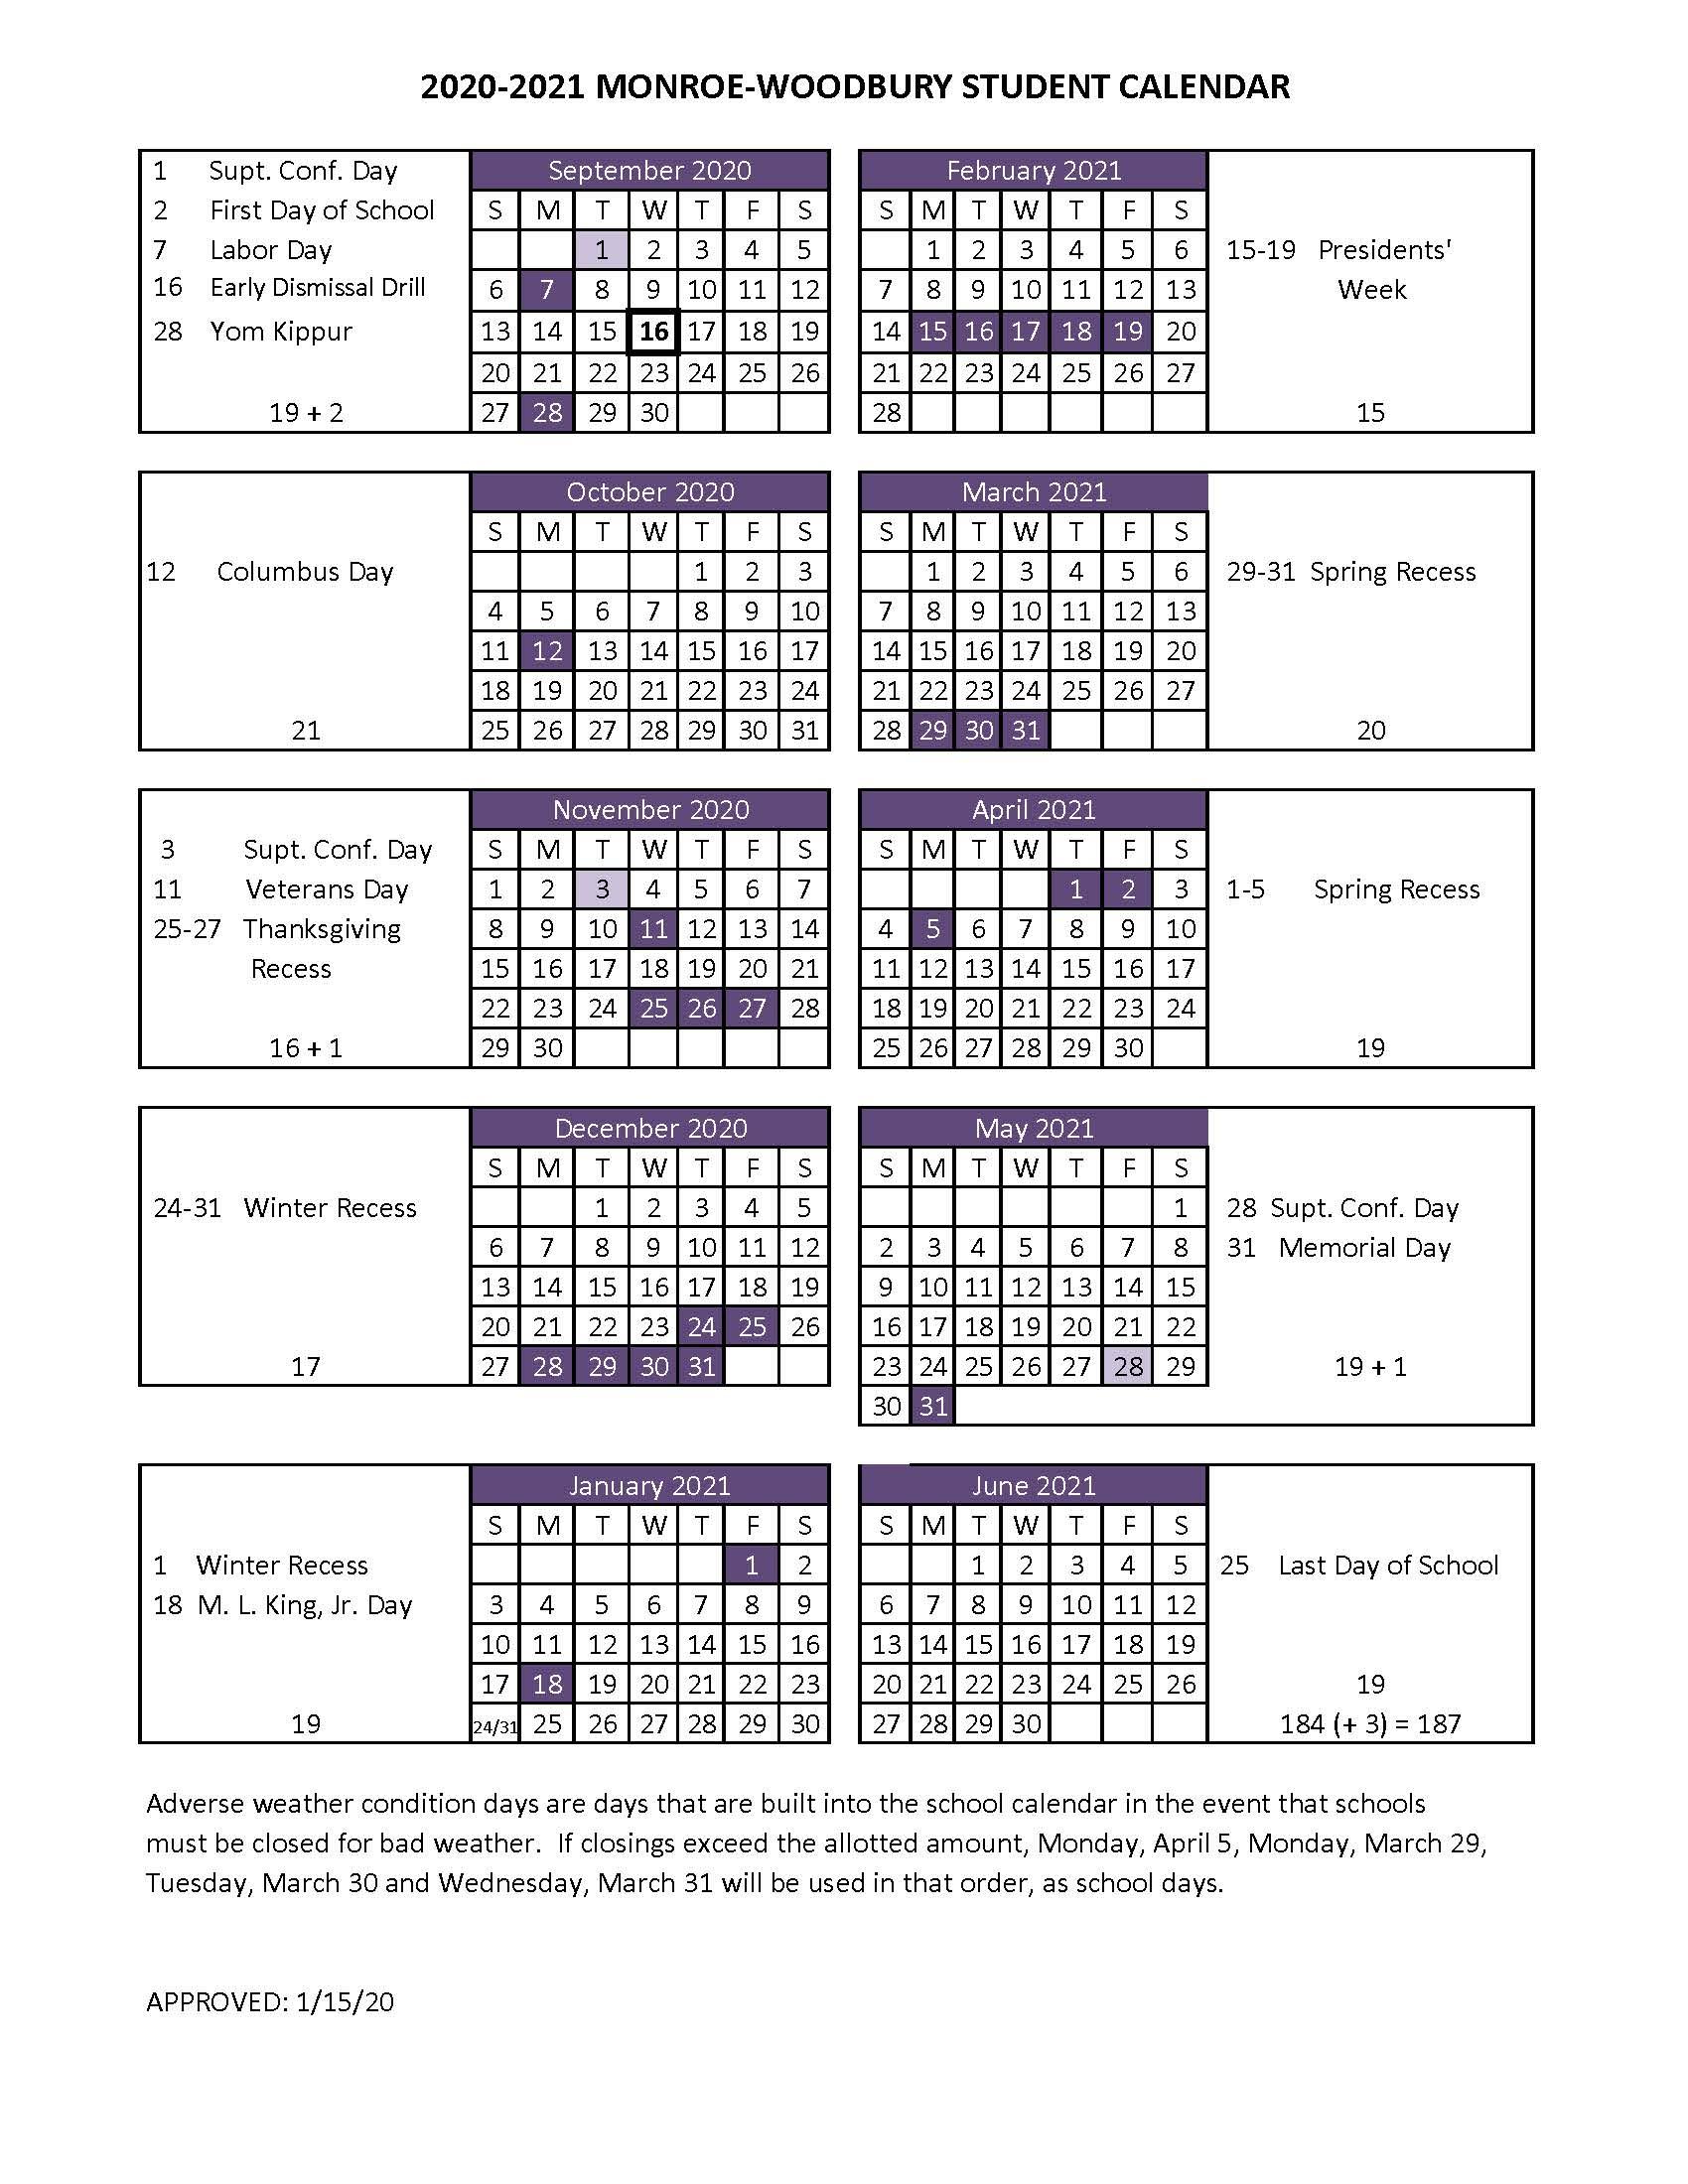 Boe Adopts 2020 2021 Student Calendar – Monroe Woodbury Inside Albany City School District Calendar 2021